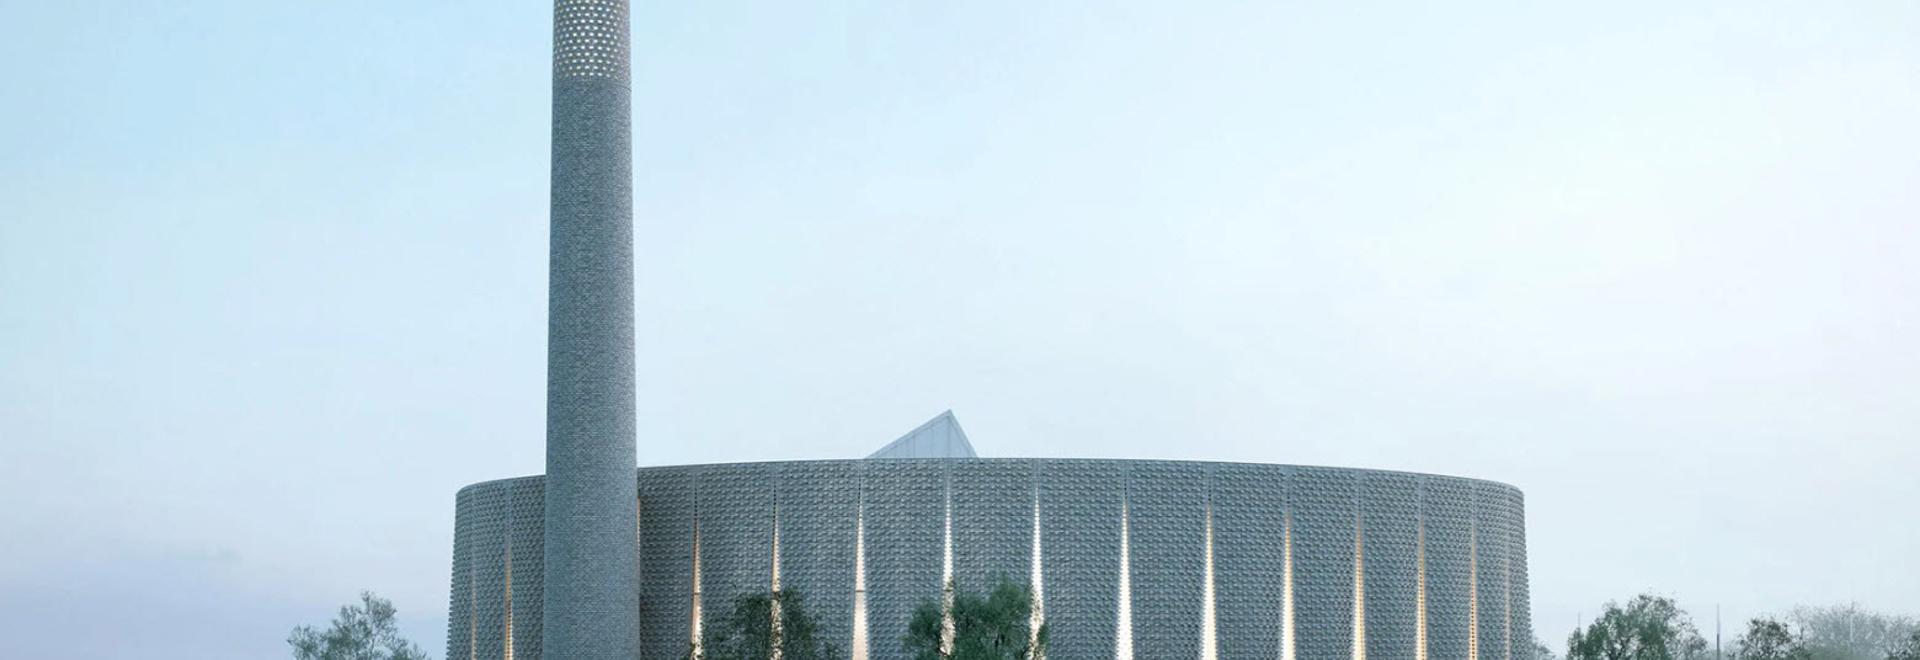 Luca Poian Forms diseña una mezquita de ladrillo decorativa para Preston